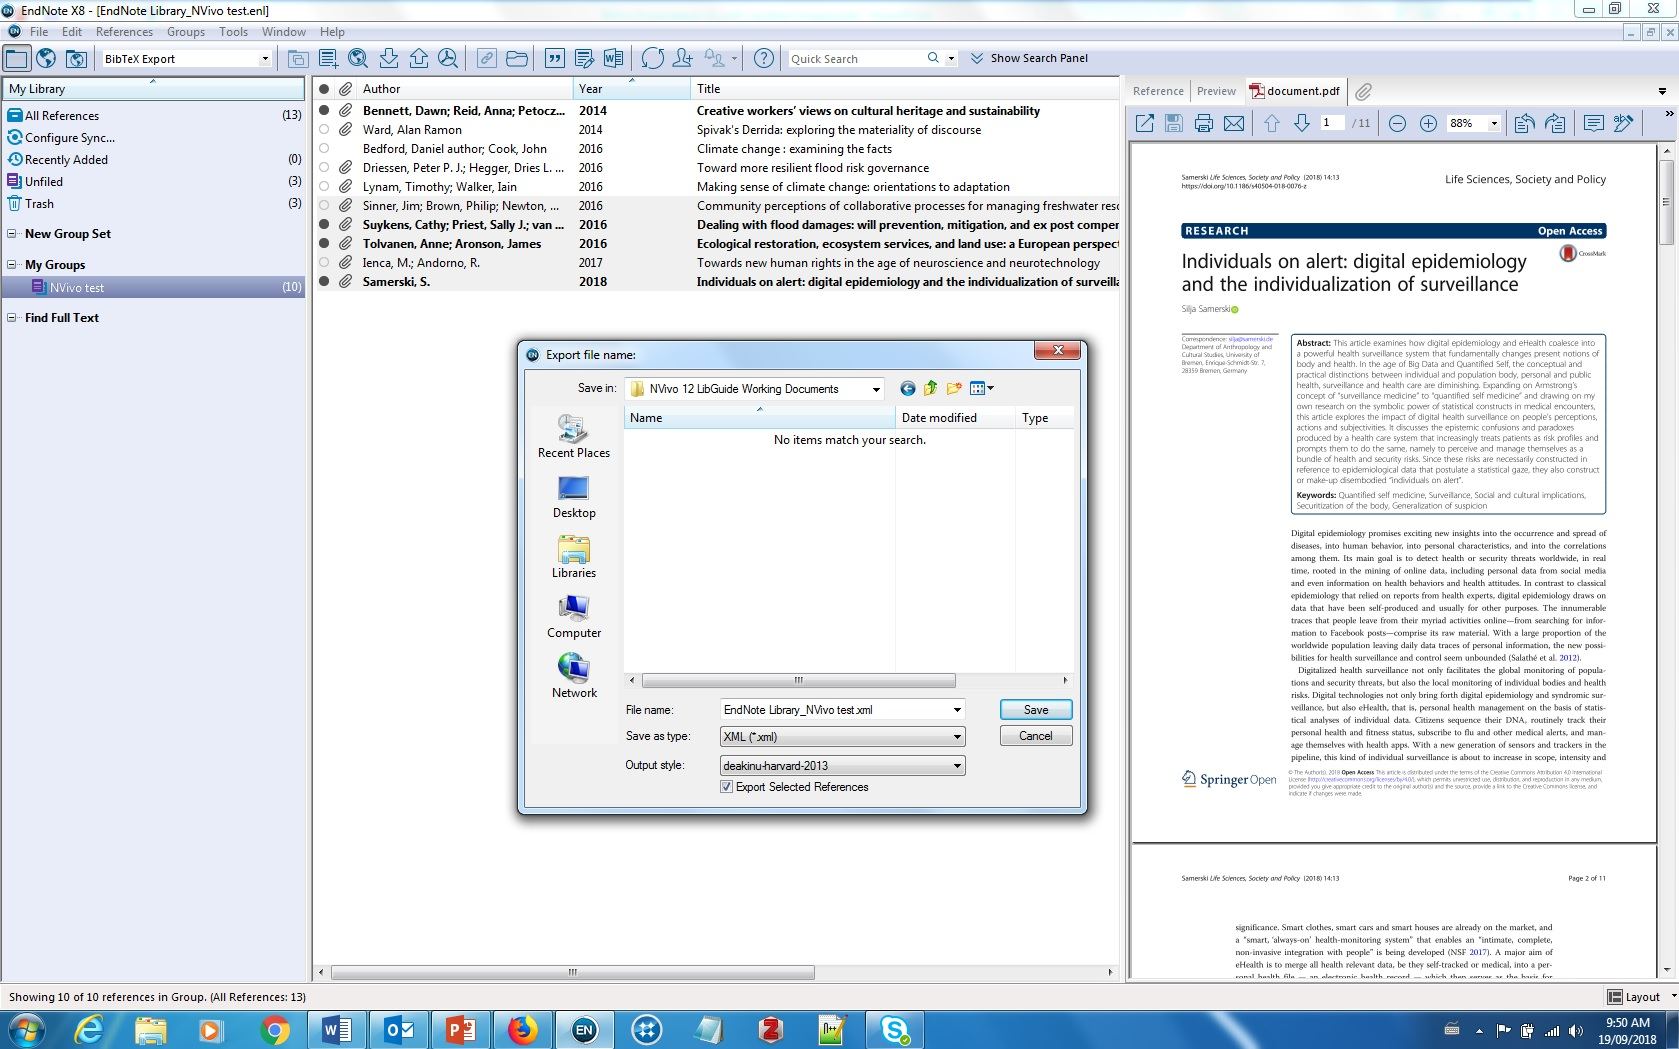 Screenshot of Endnote export screen